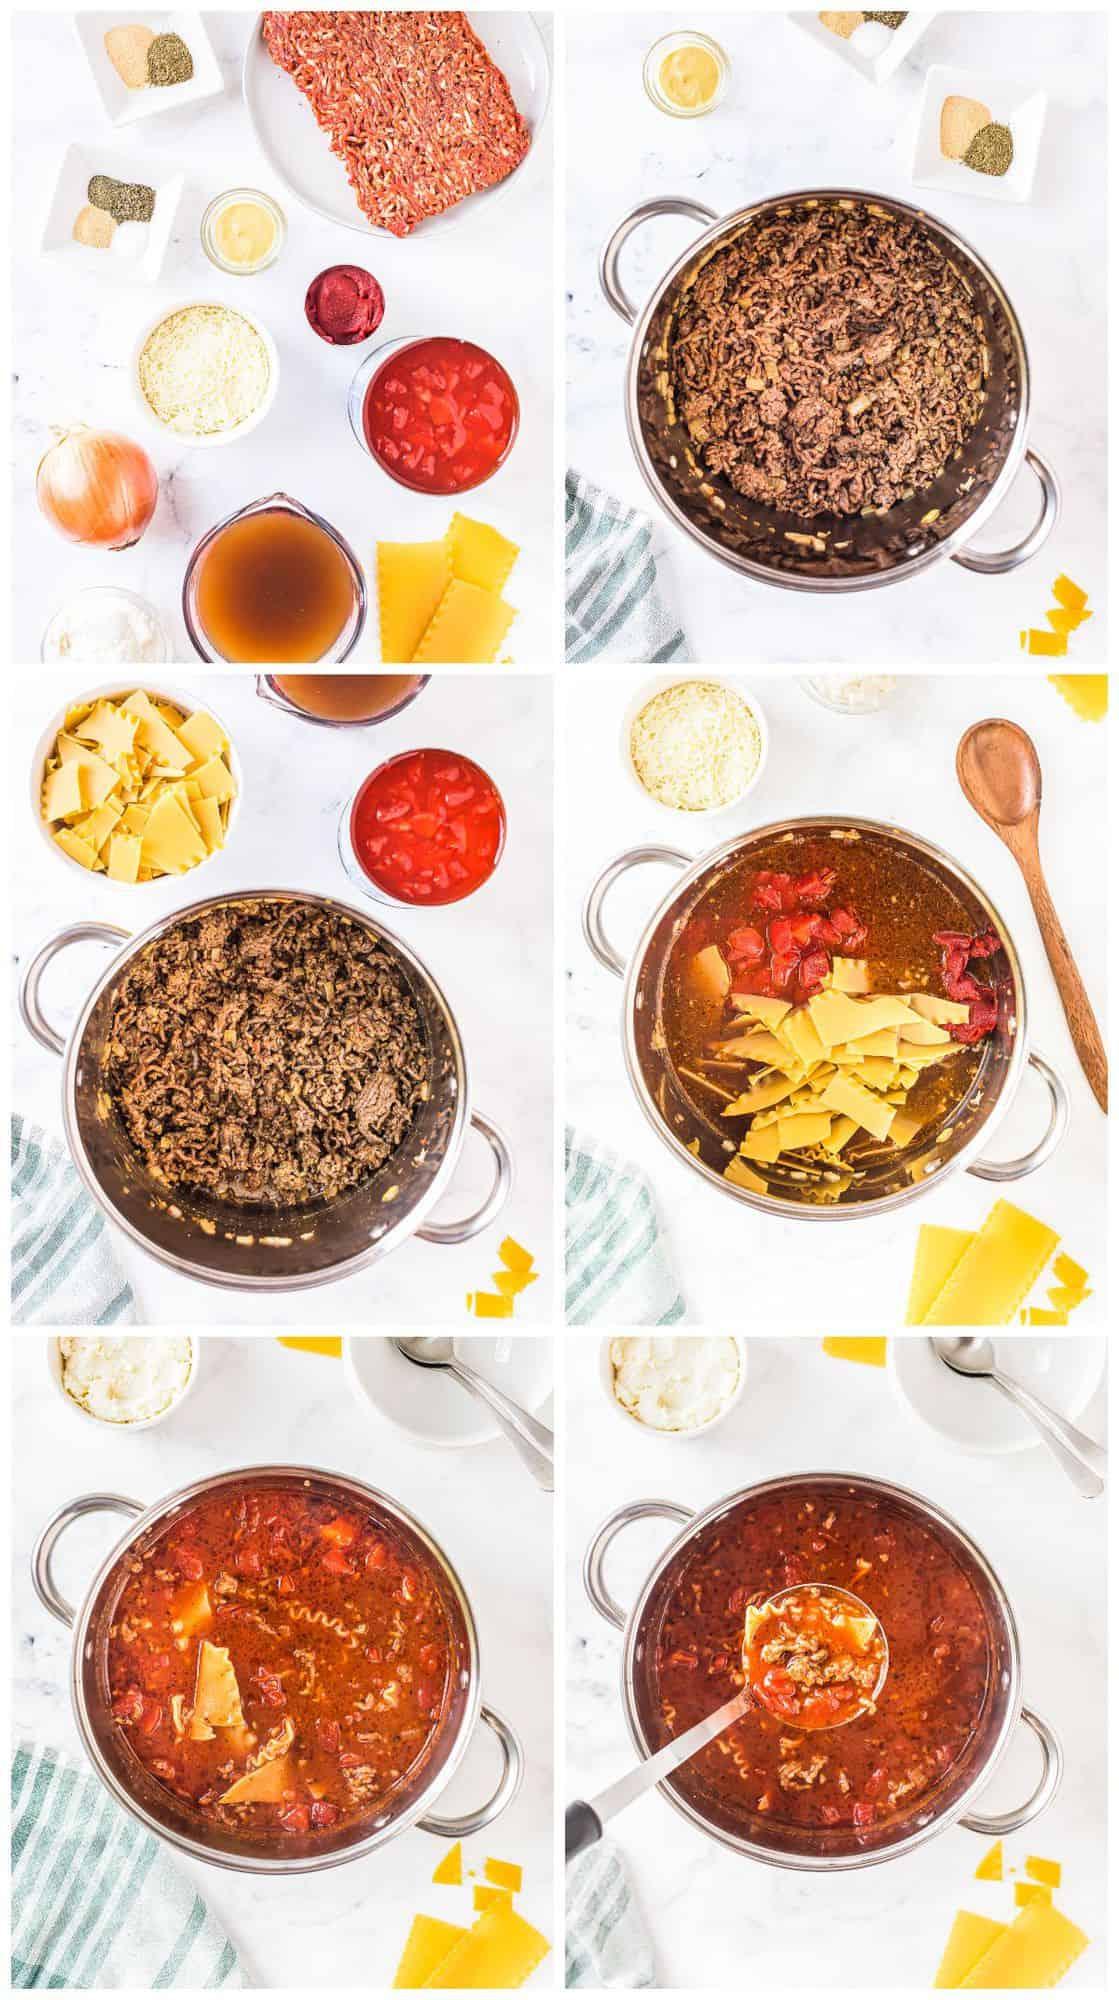 how to make lasagna soup step by step recipe photos